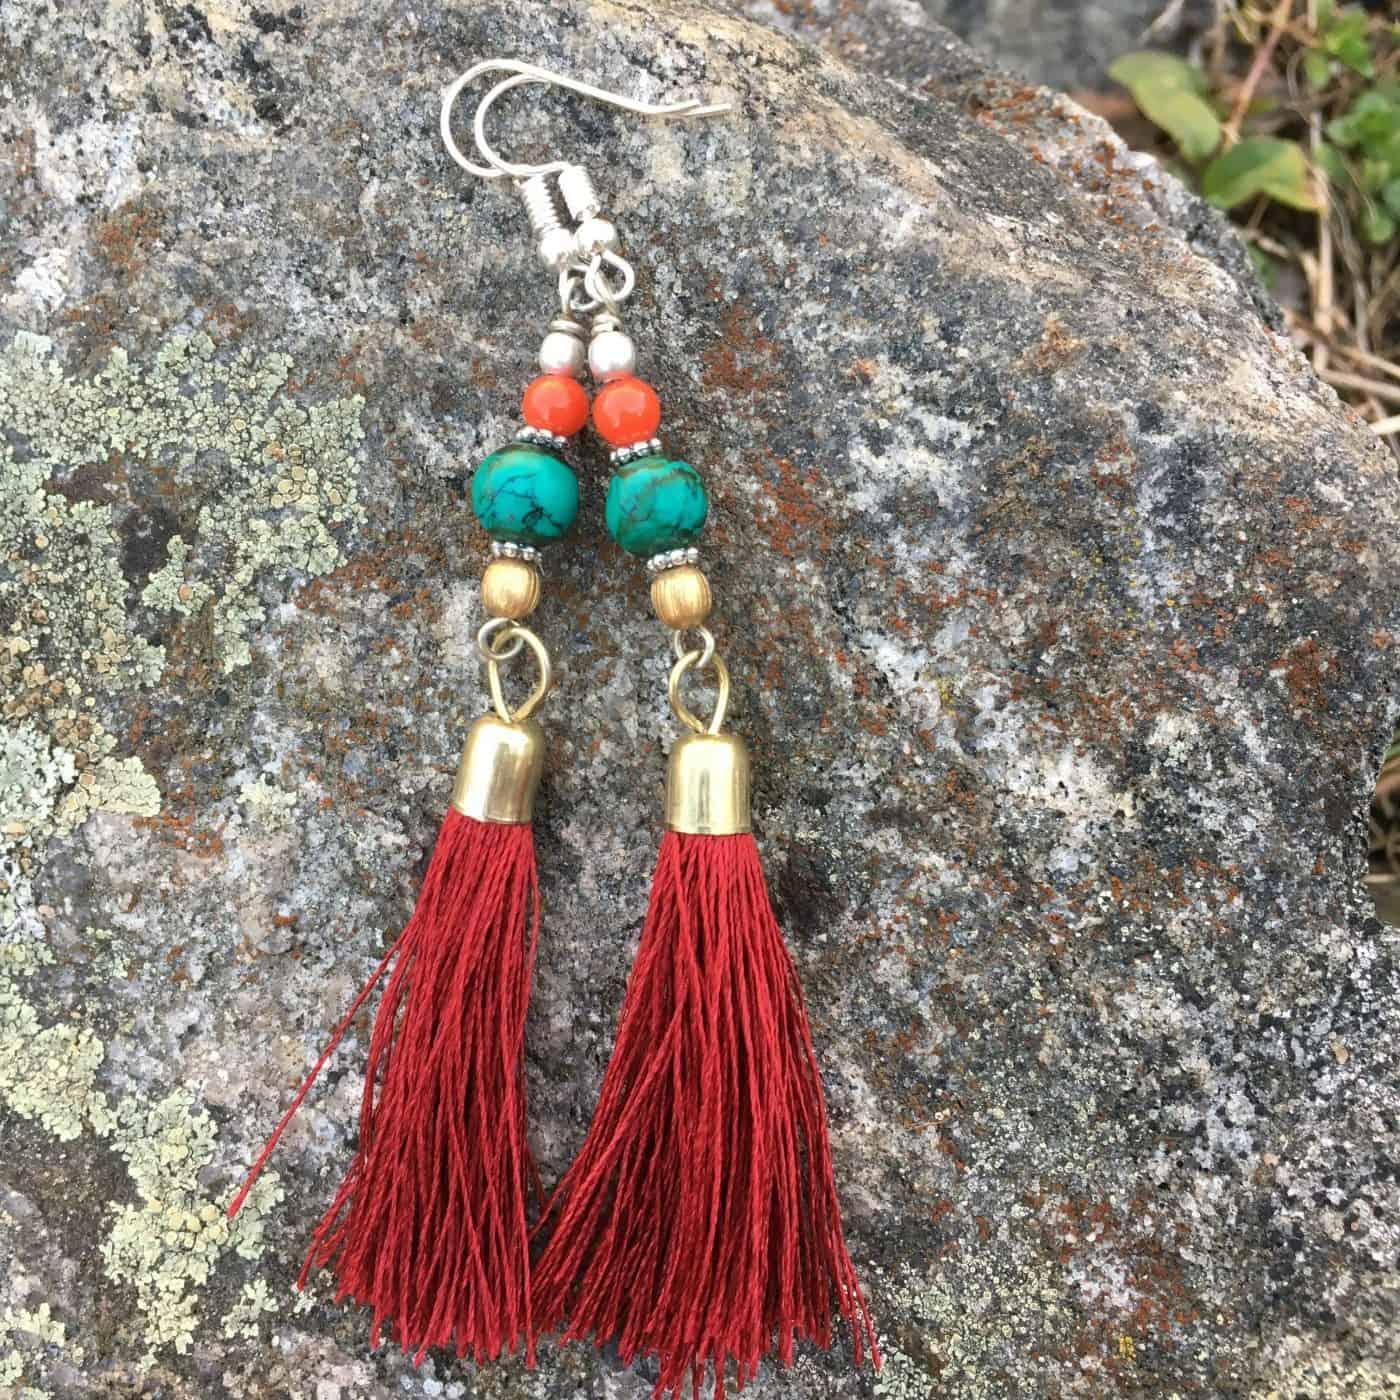 Fair Trade tassel earrings